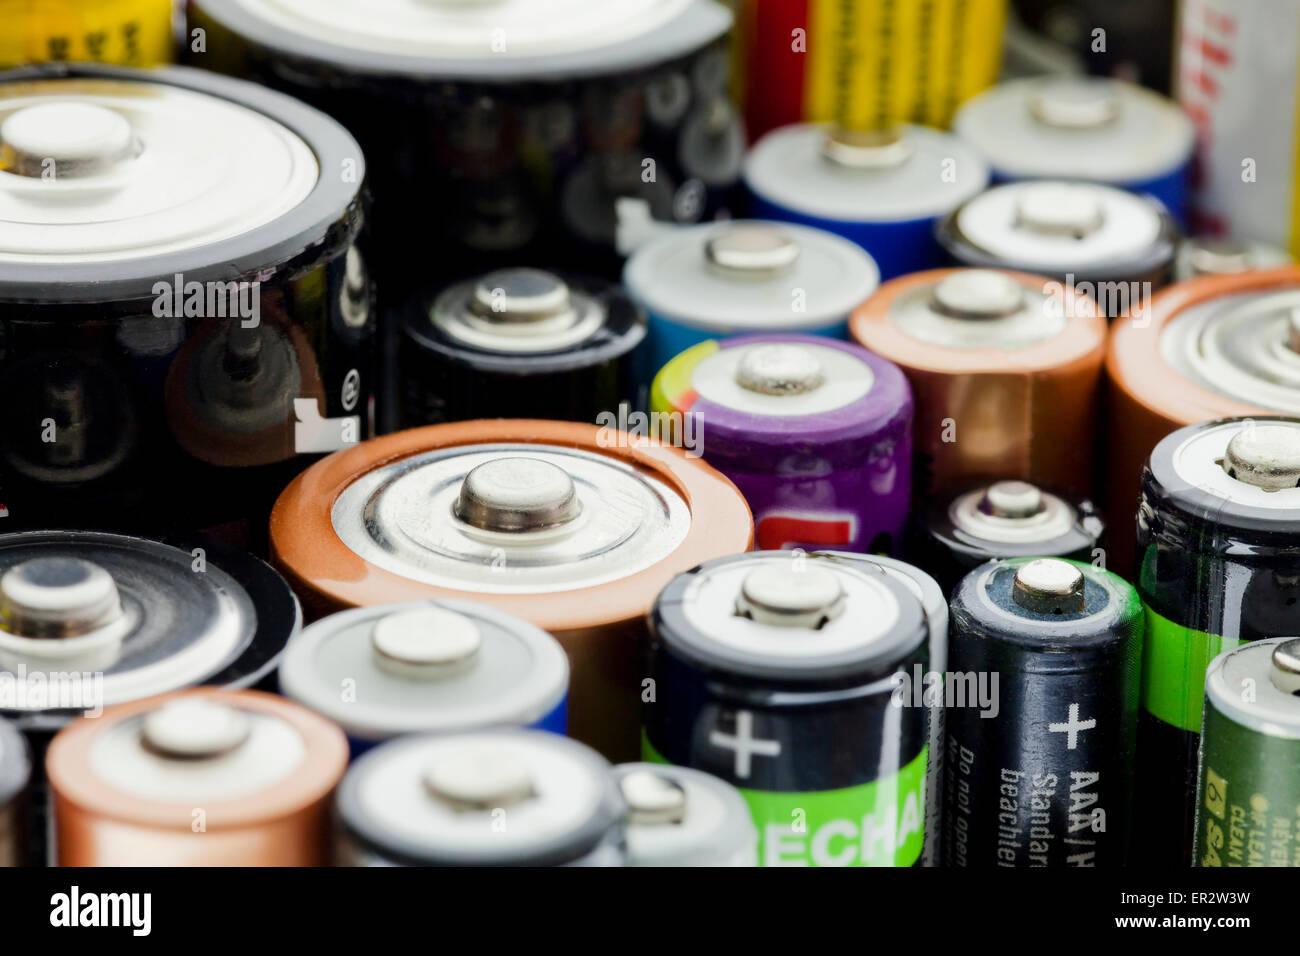 Household batteries - Stock Image